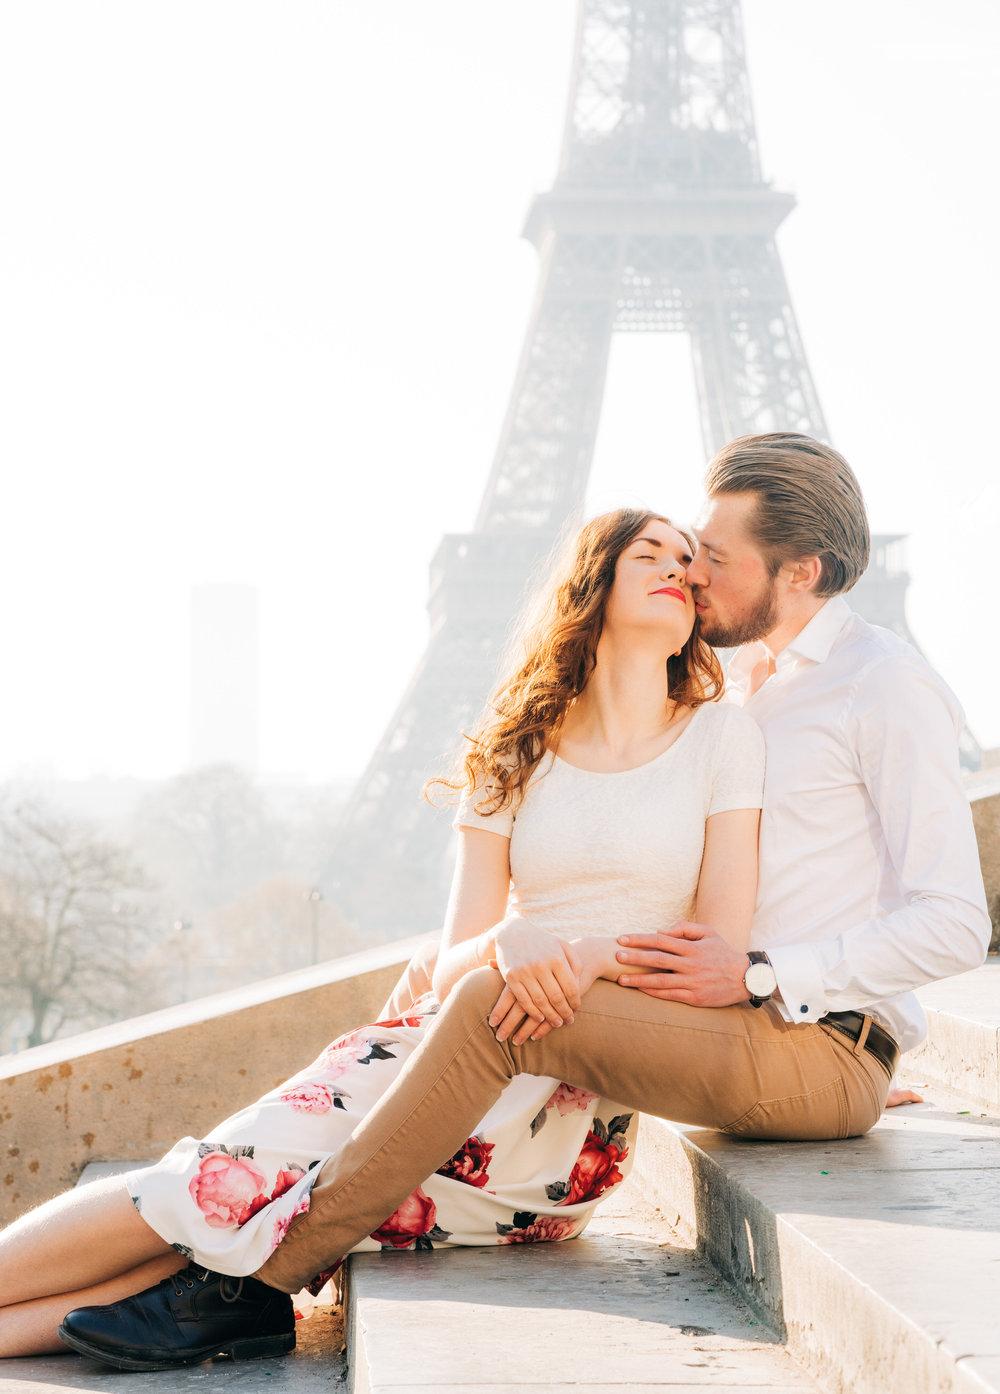 picture me paris couples photo shoot in paris at the eiffel tower